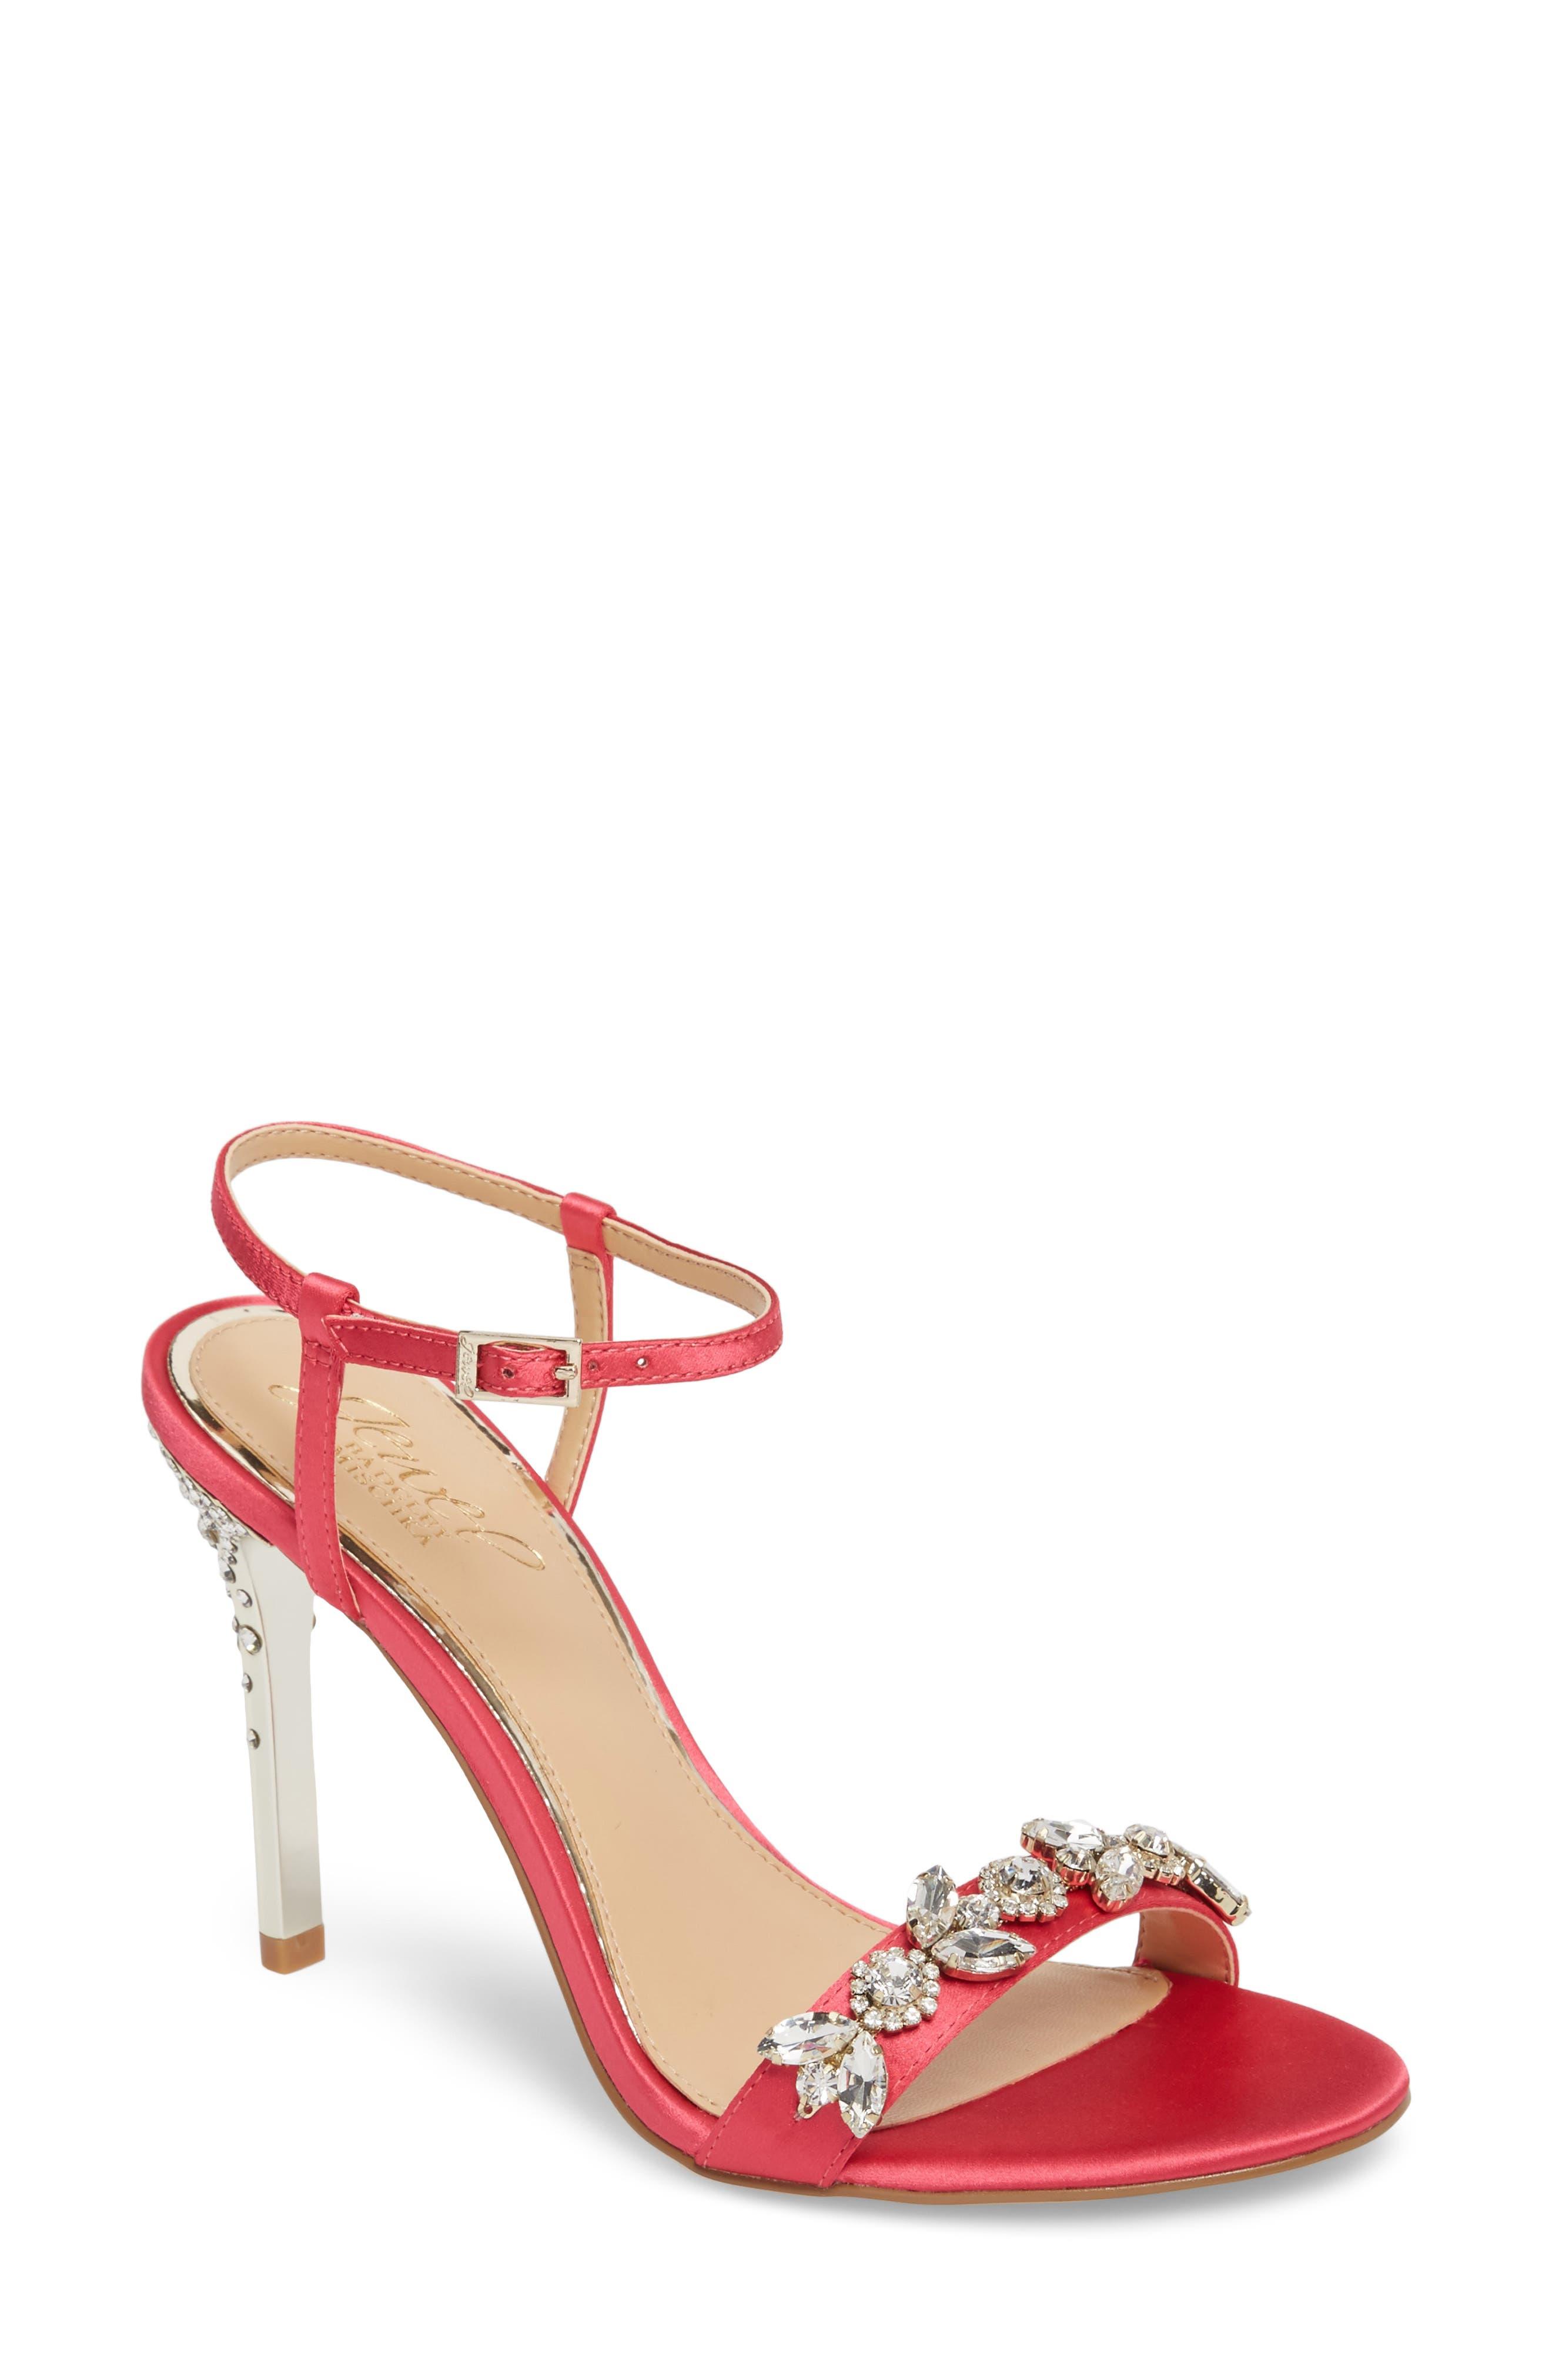 Main Image - Jewel Badgley Mischka Tex Ankle Strap Sandal (Women)